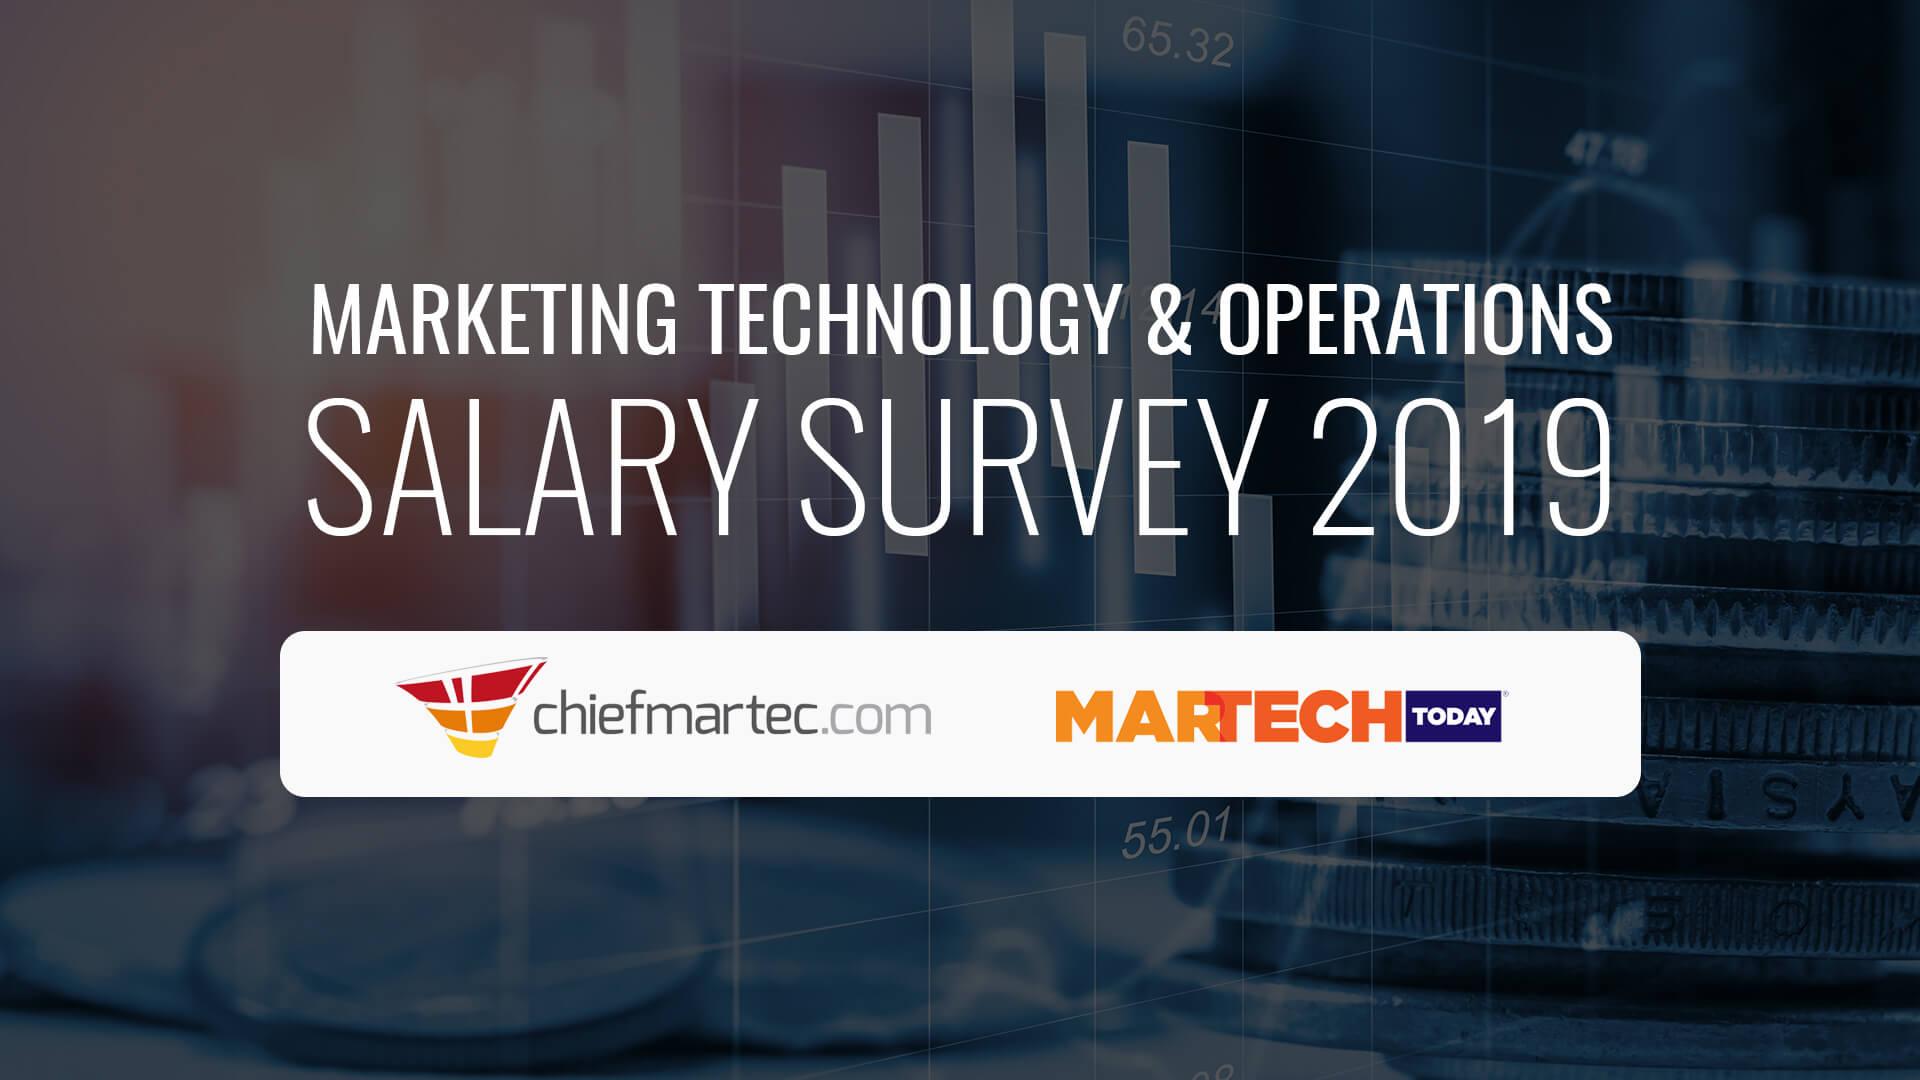 Marketing salary survey 2019: A global snapshot